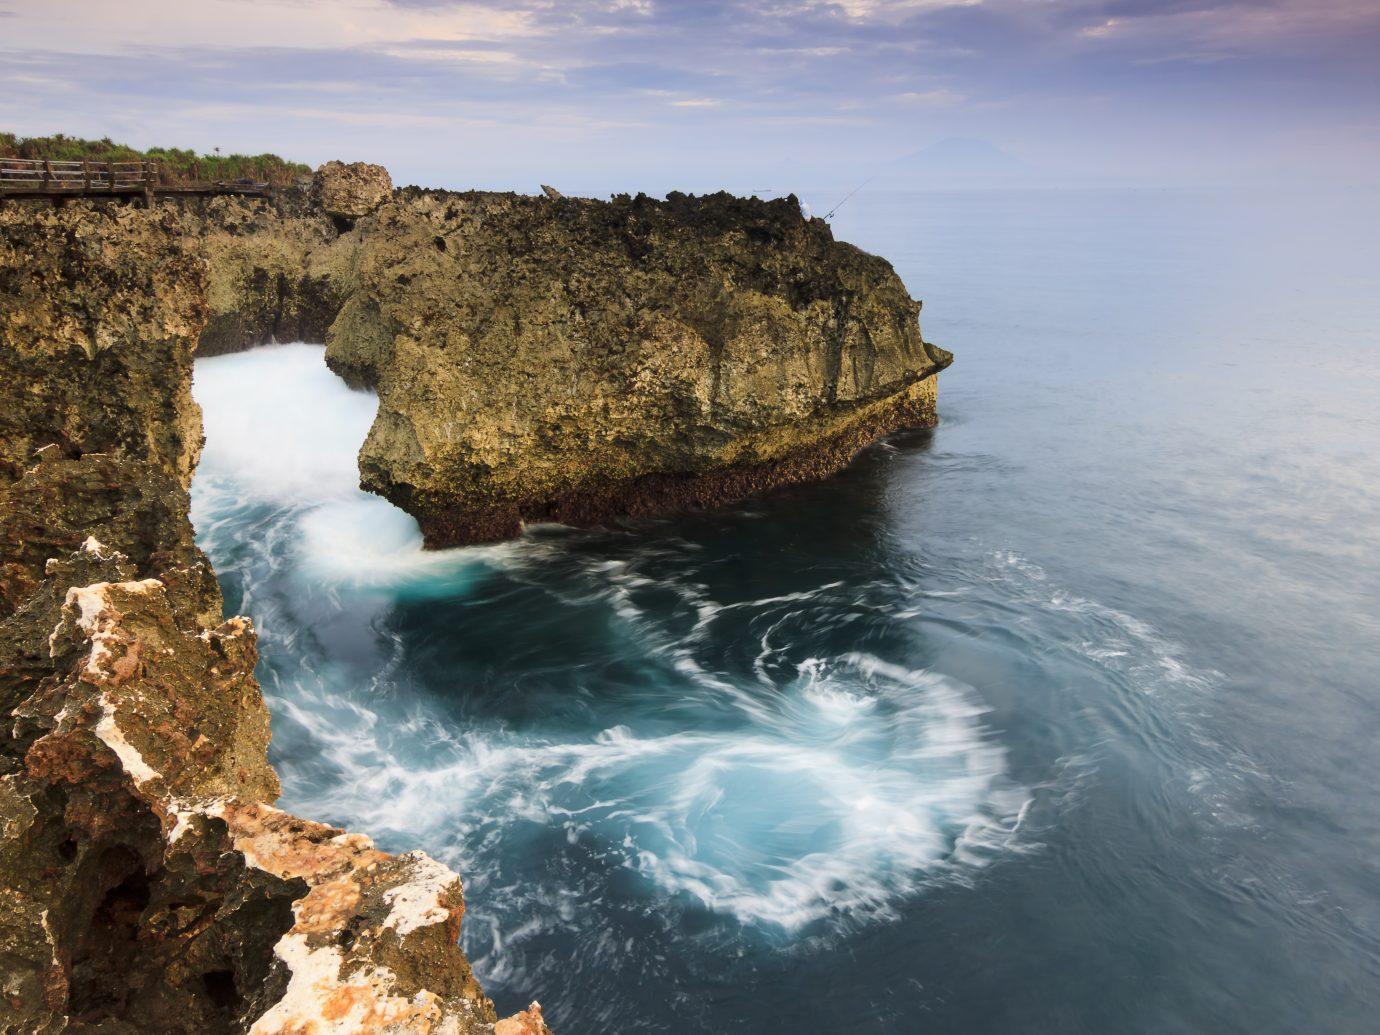 Coastal landscape at Water Blow, Bali, Indonesia